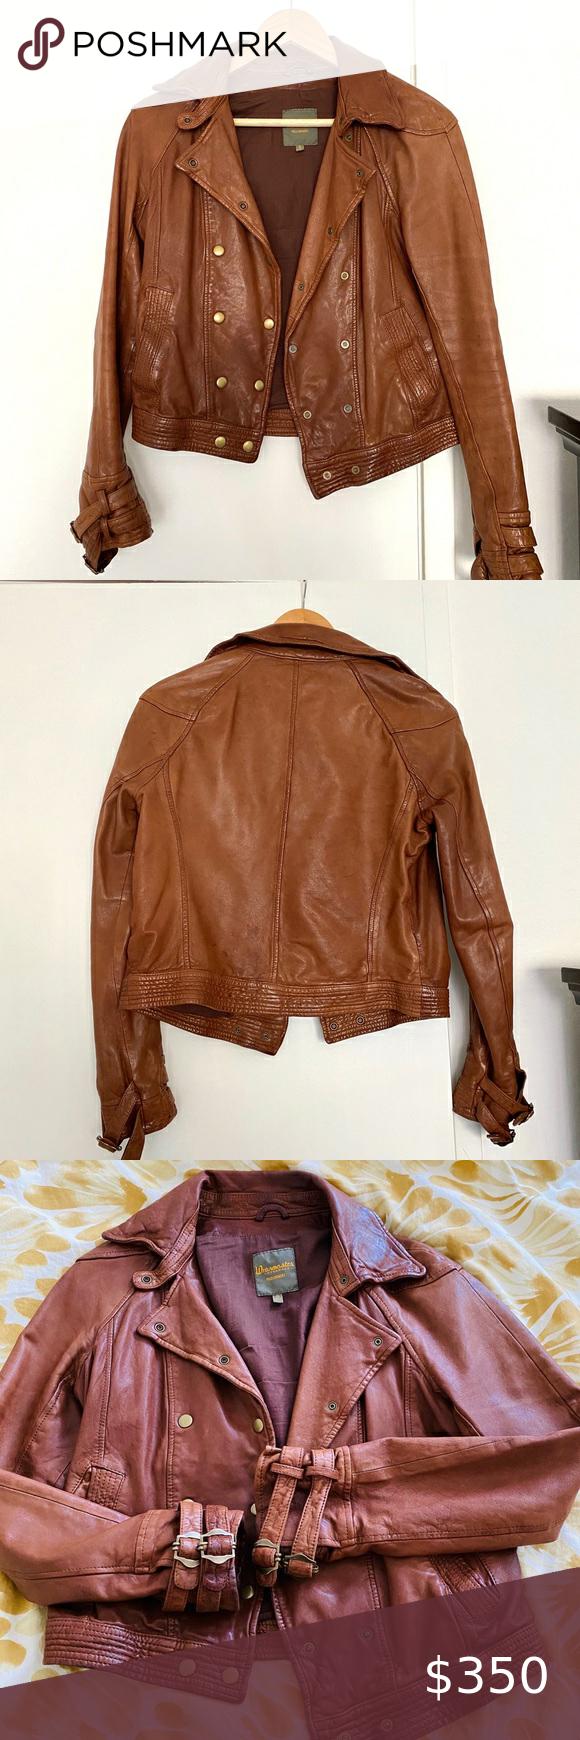 Madewell Wearmaster Brown 100 Leather Jacket Leather Jacket Genuine Leather Jackets Jackets